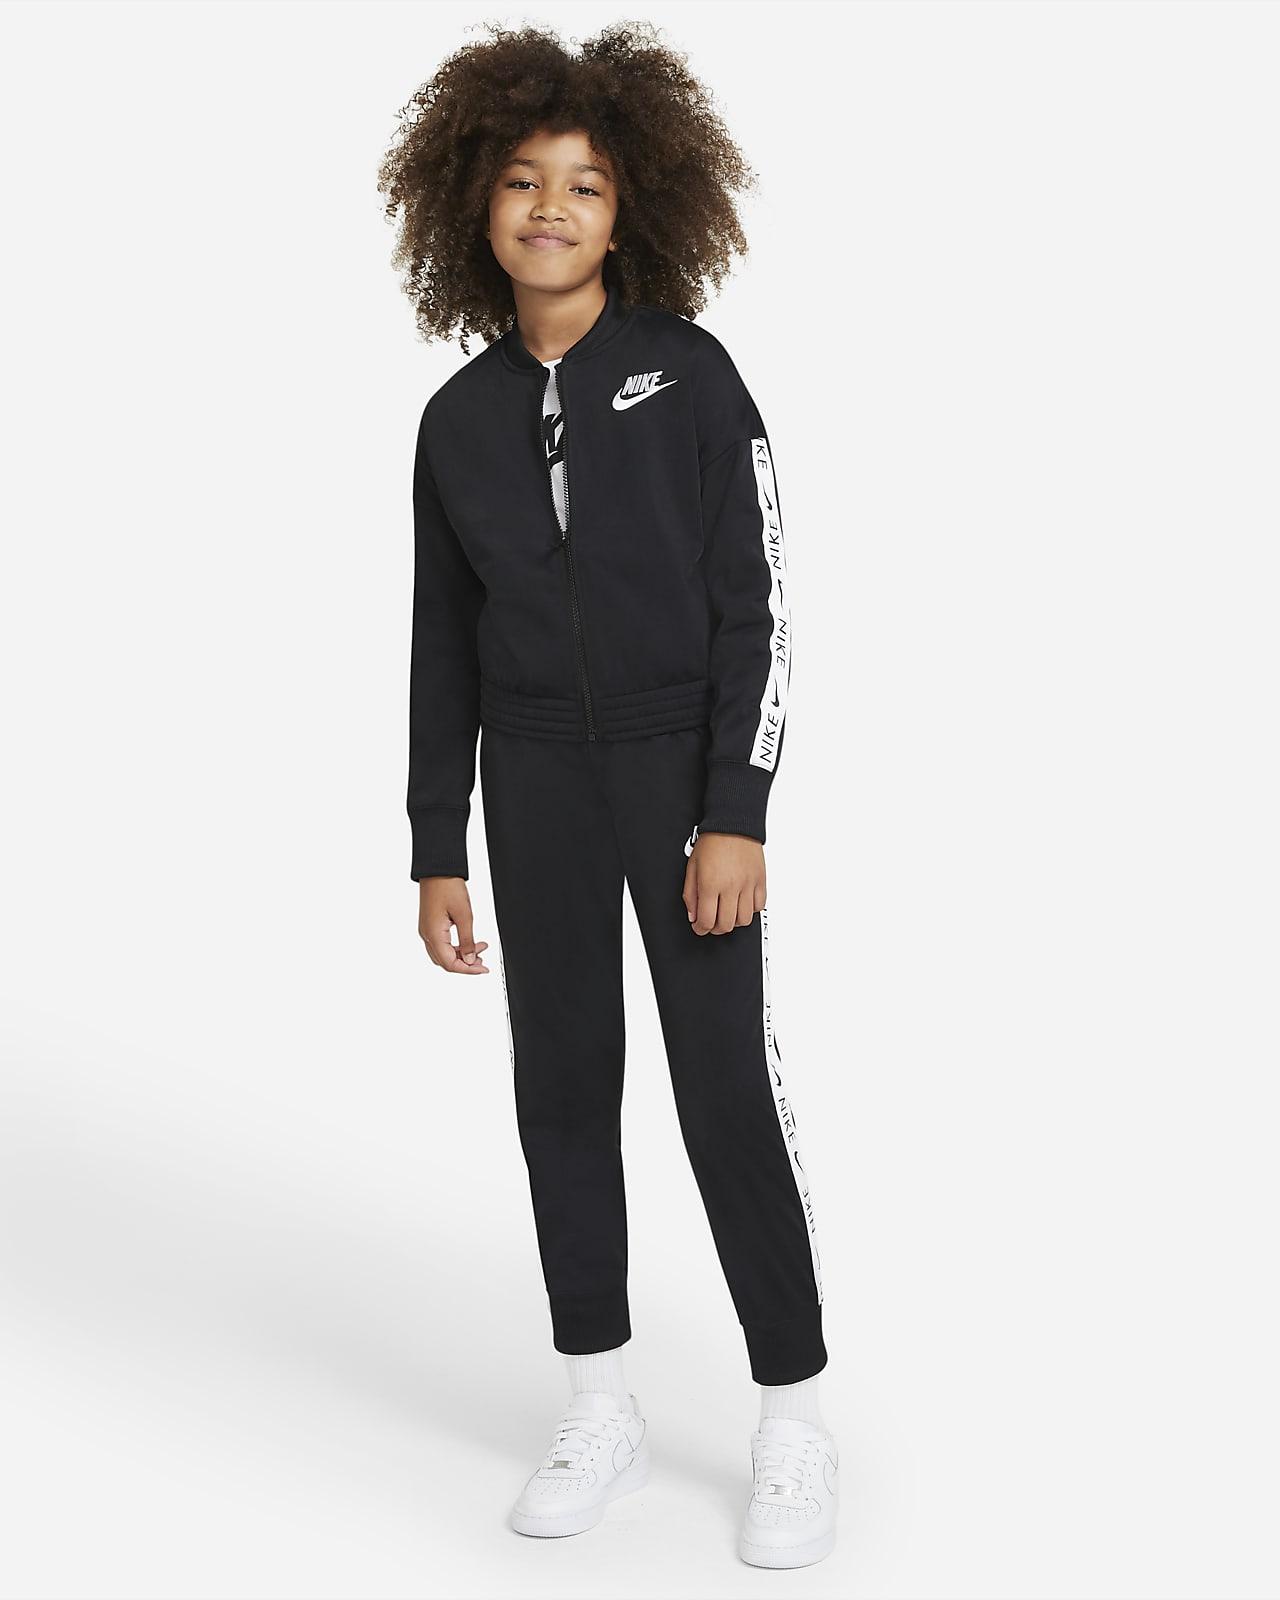 Tracksuit Nike Sportswear för ungdom